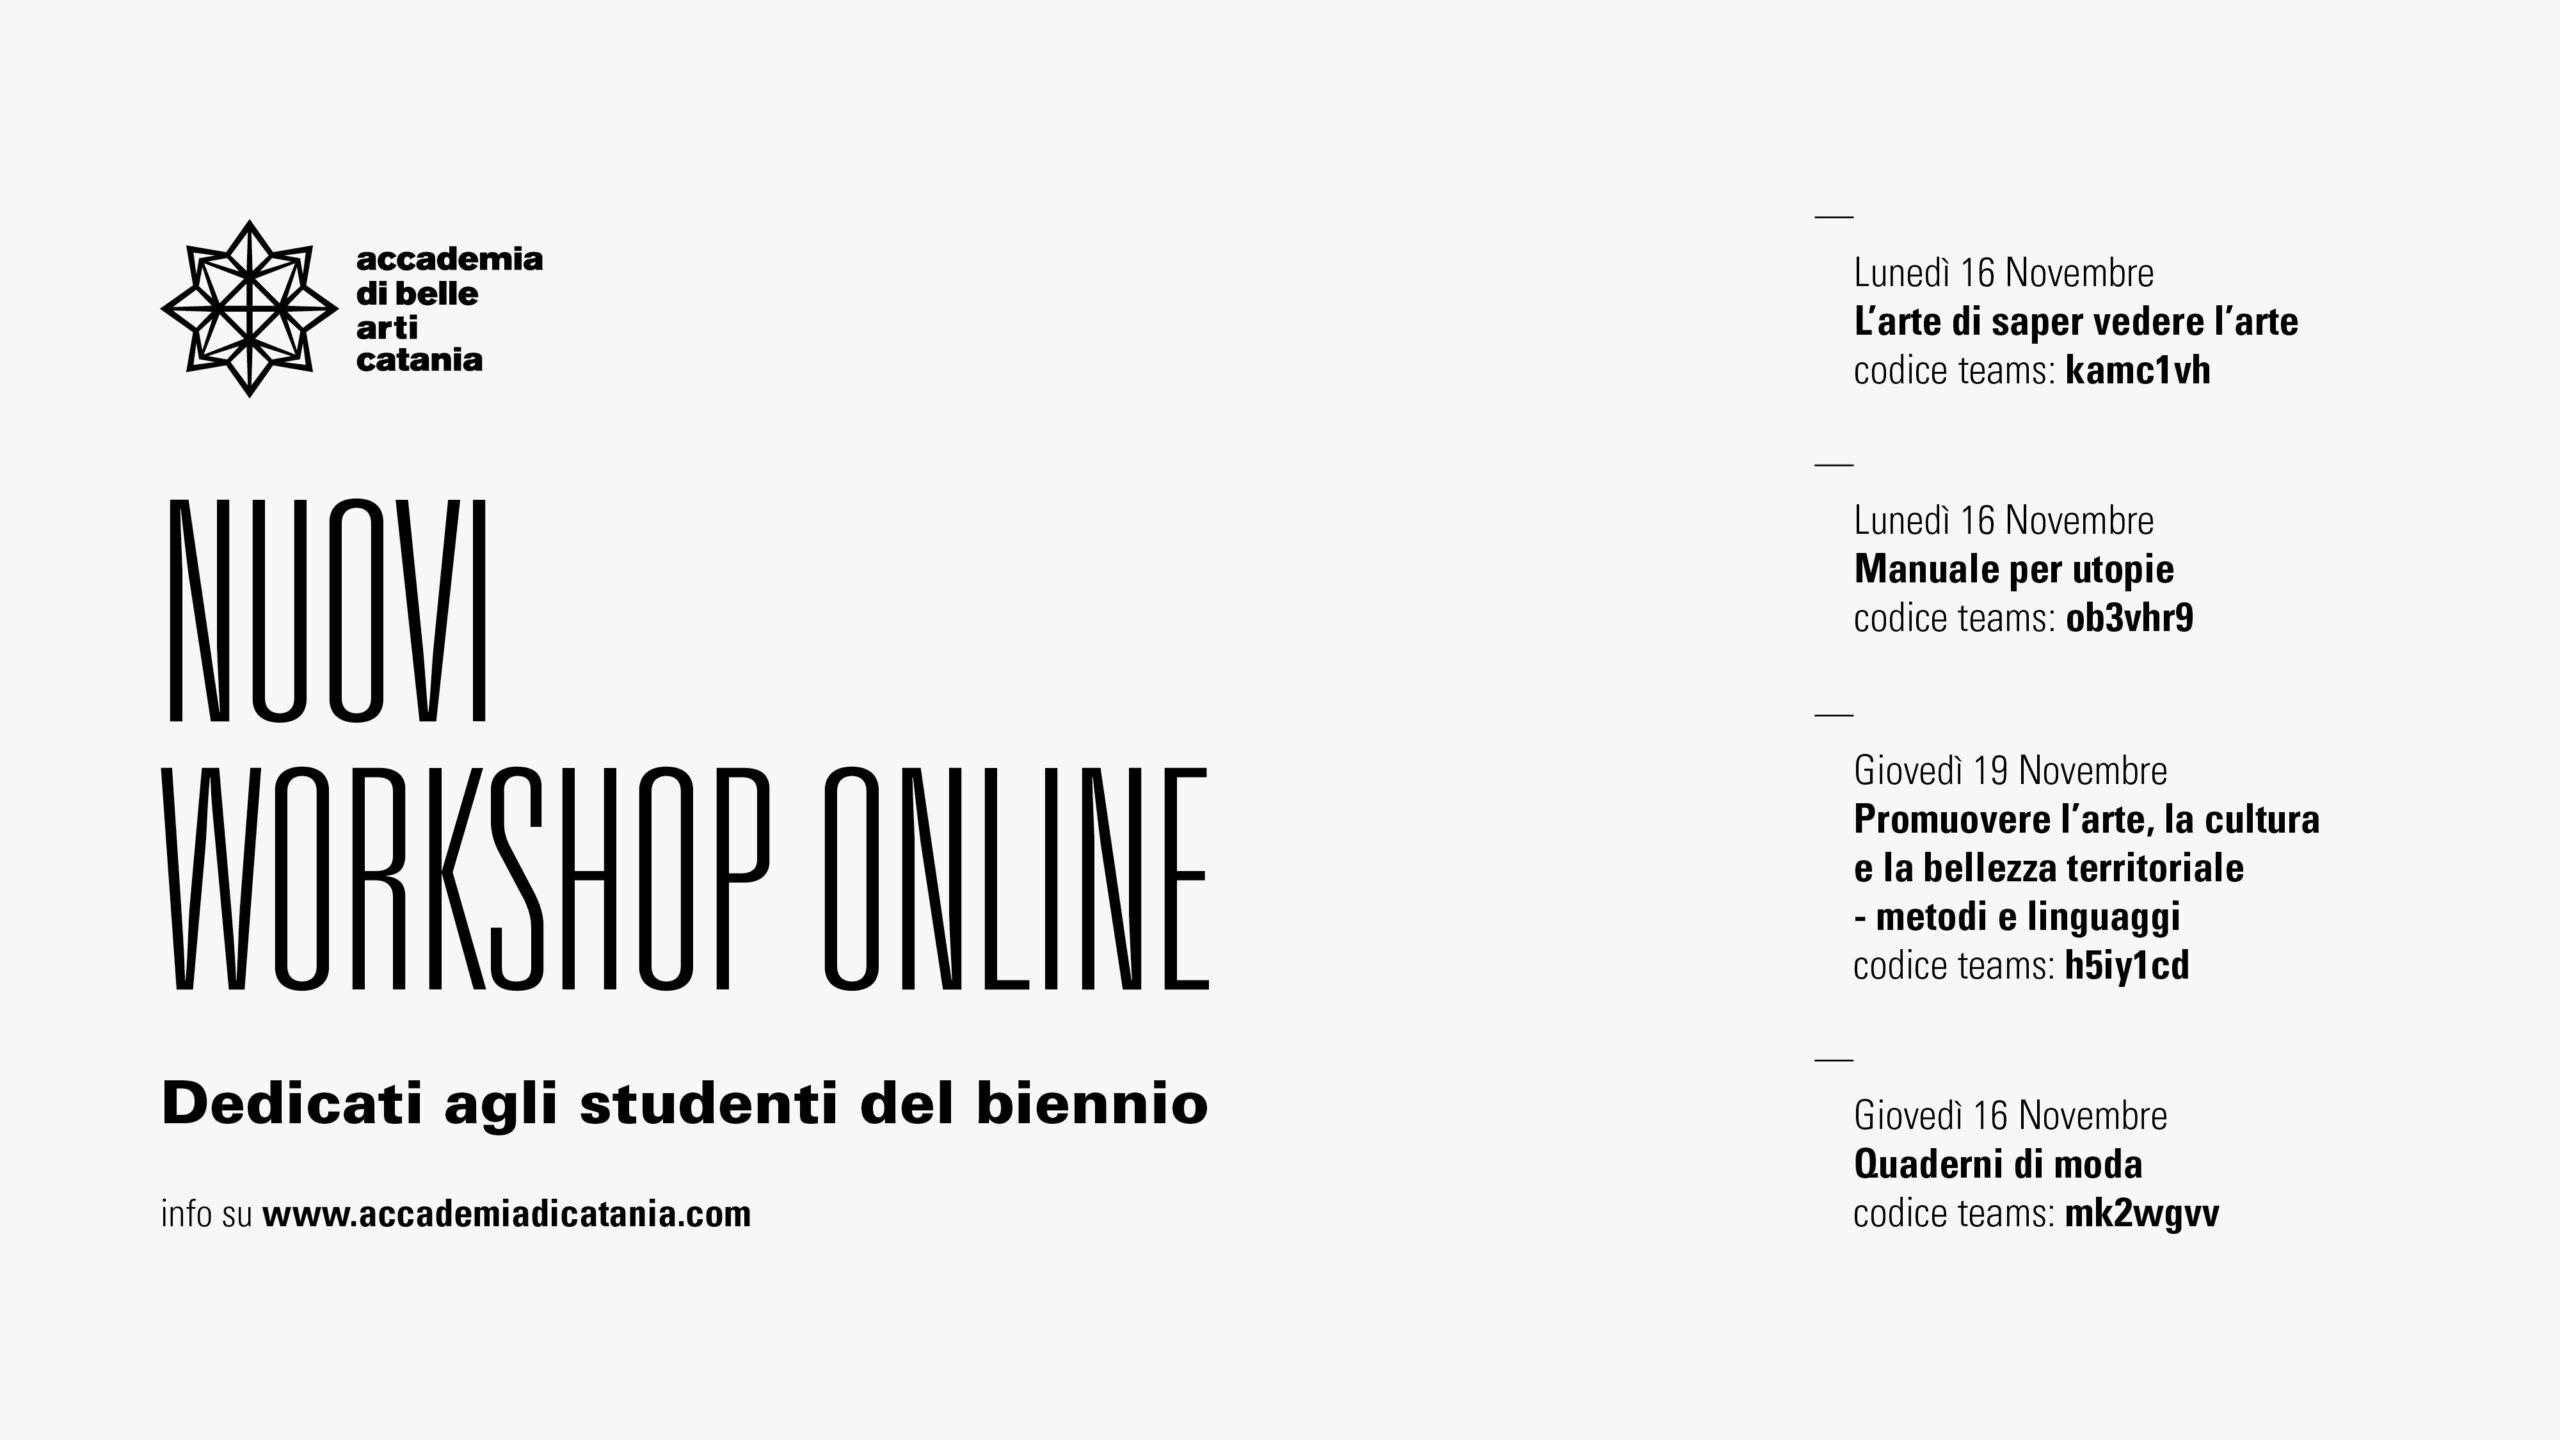 nuovi workshop online